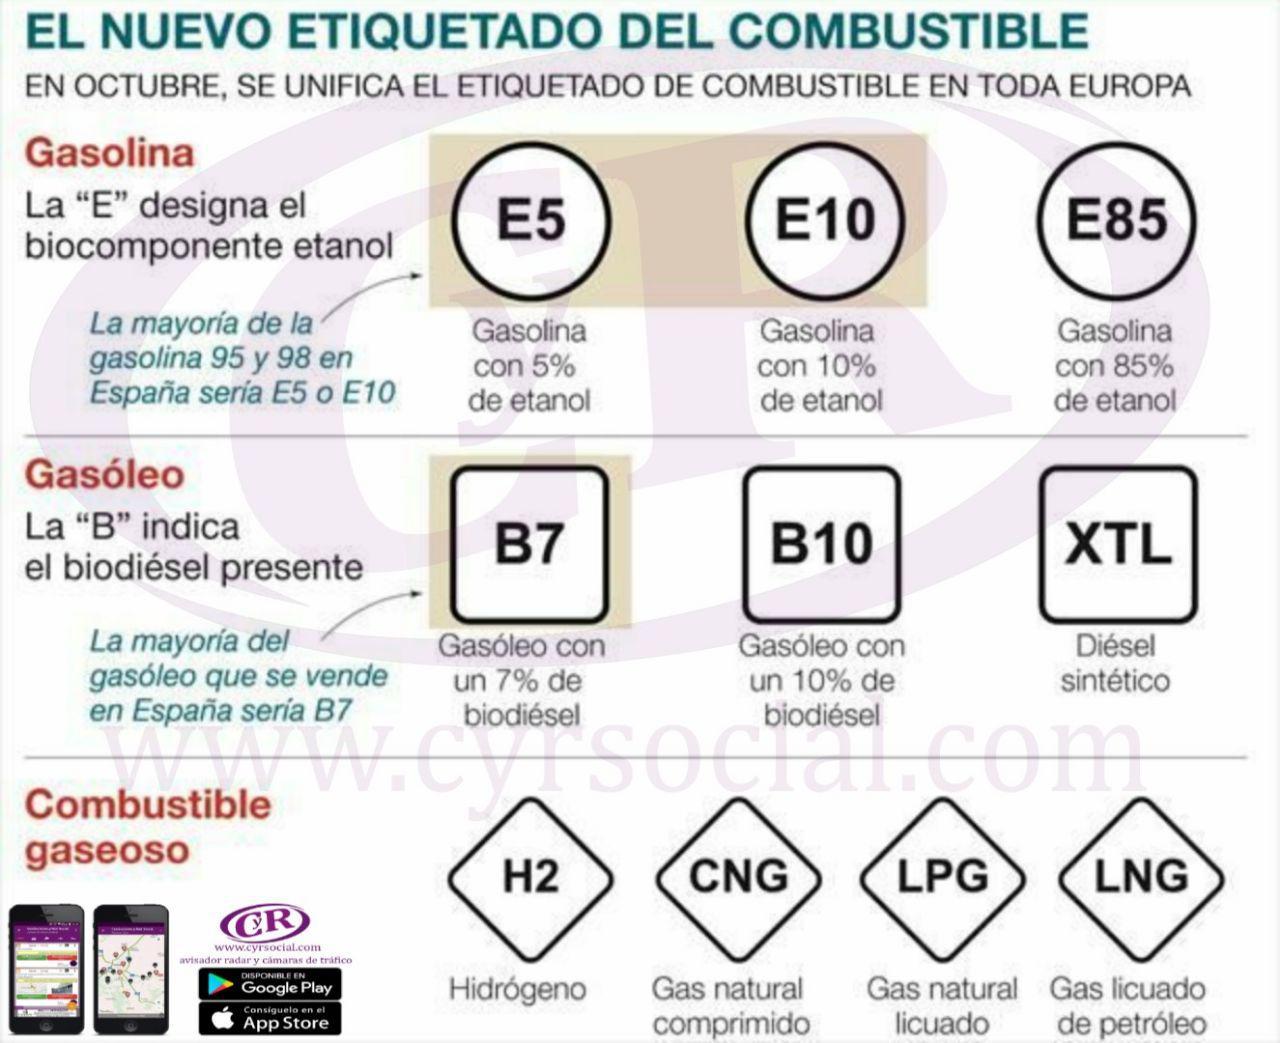 Etiquetado de combustibles gentileza de CyrSocial